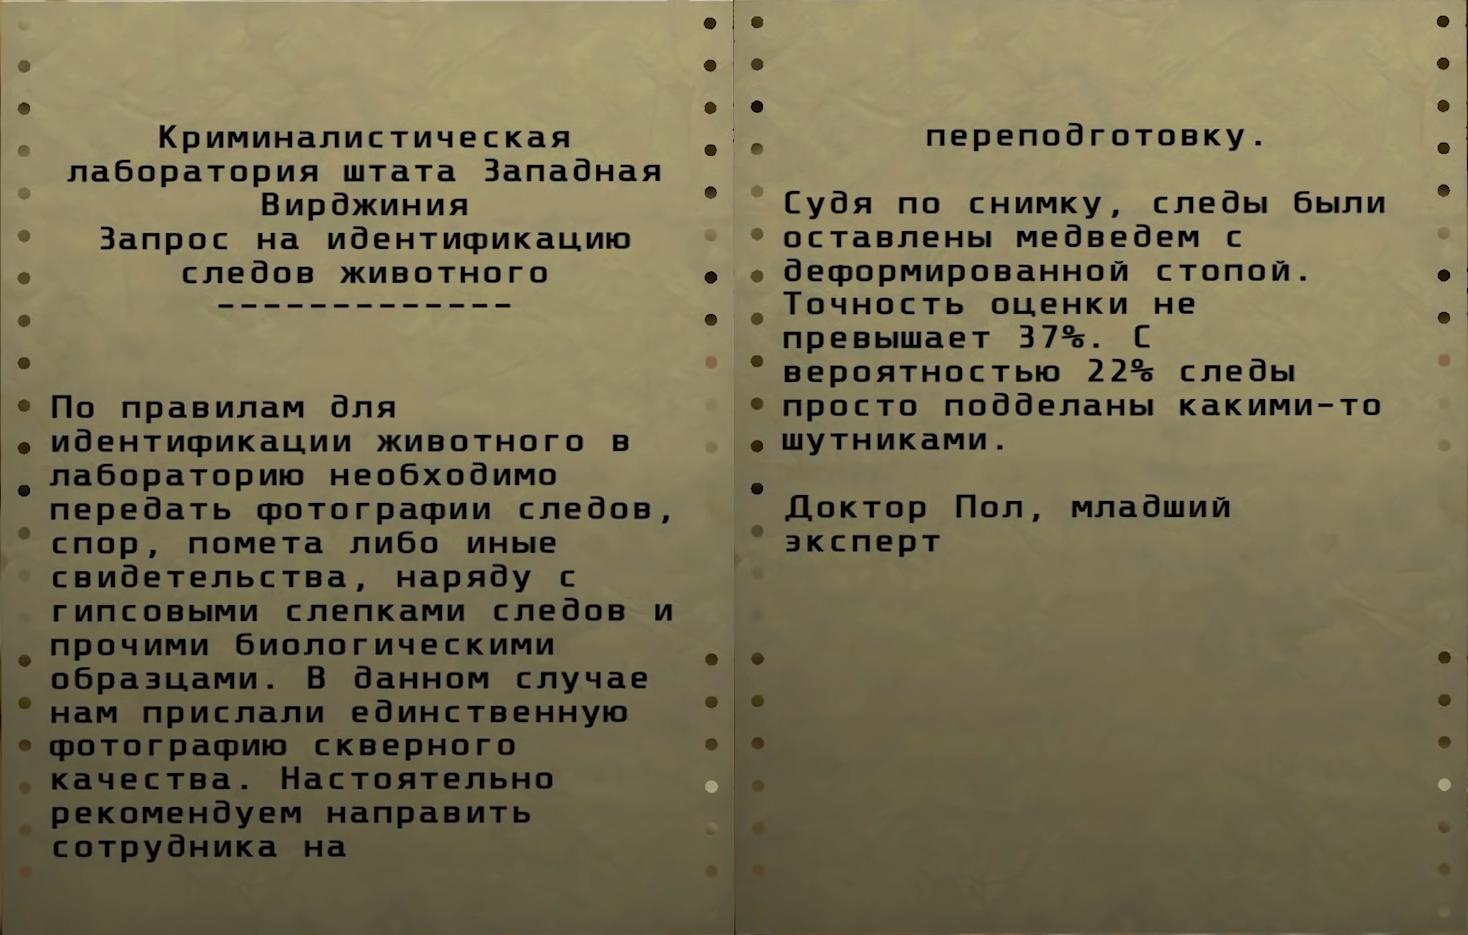 Отчёт криминалистов